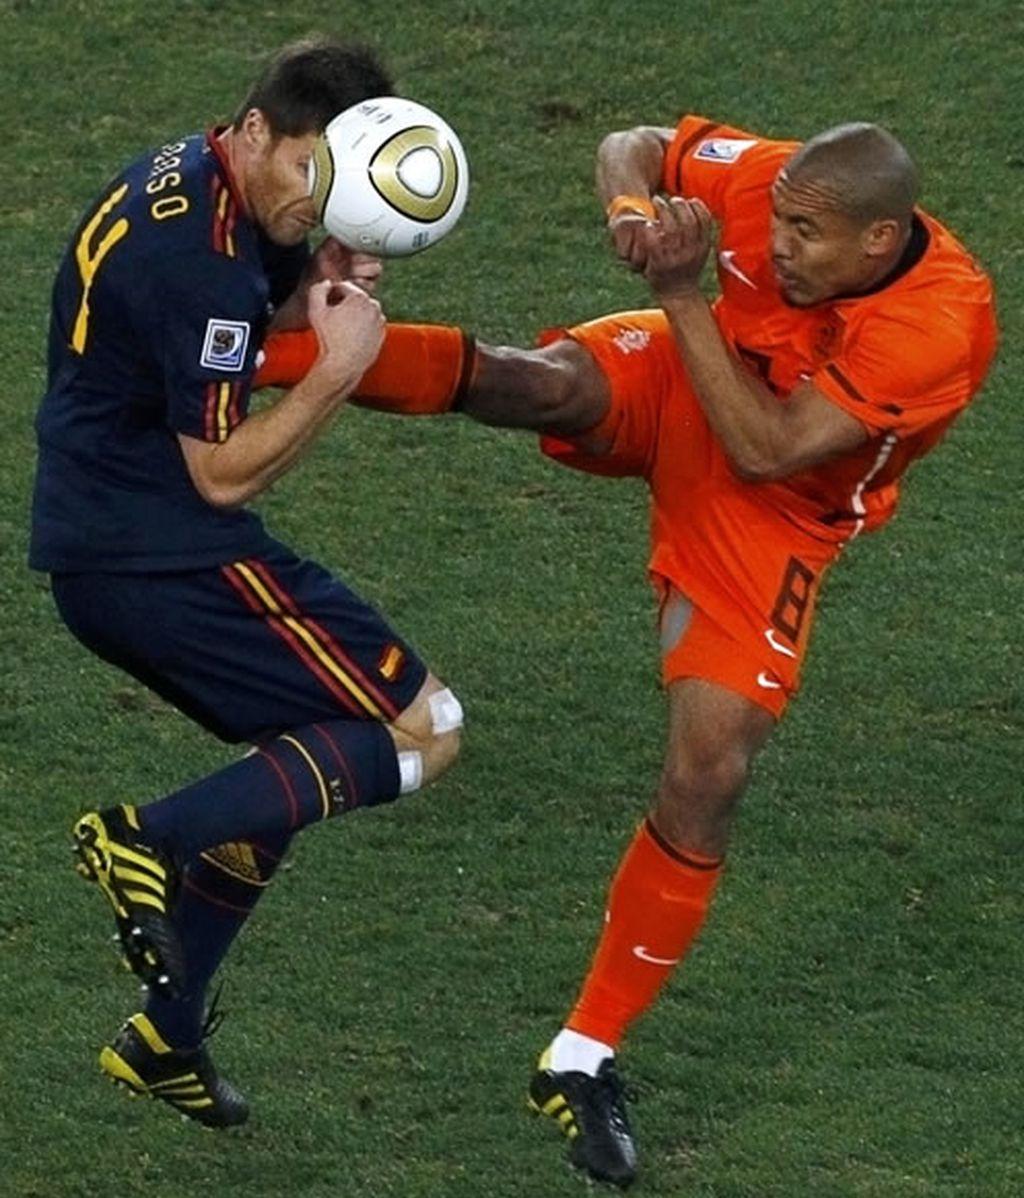 De Jong, expulsado de Holanda